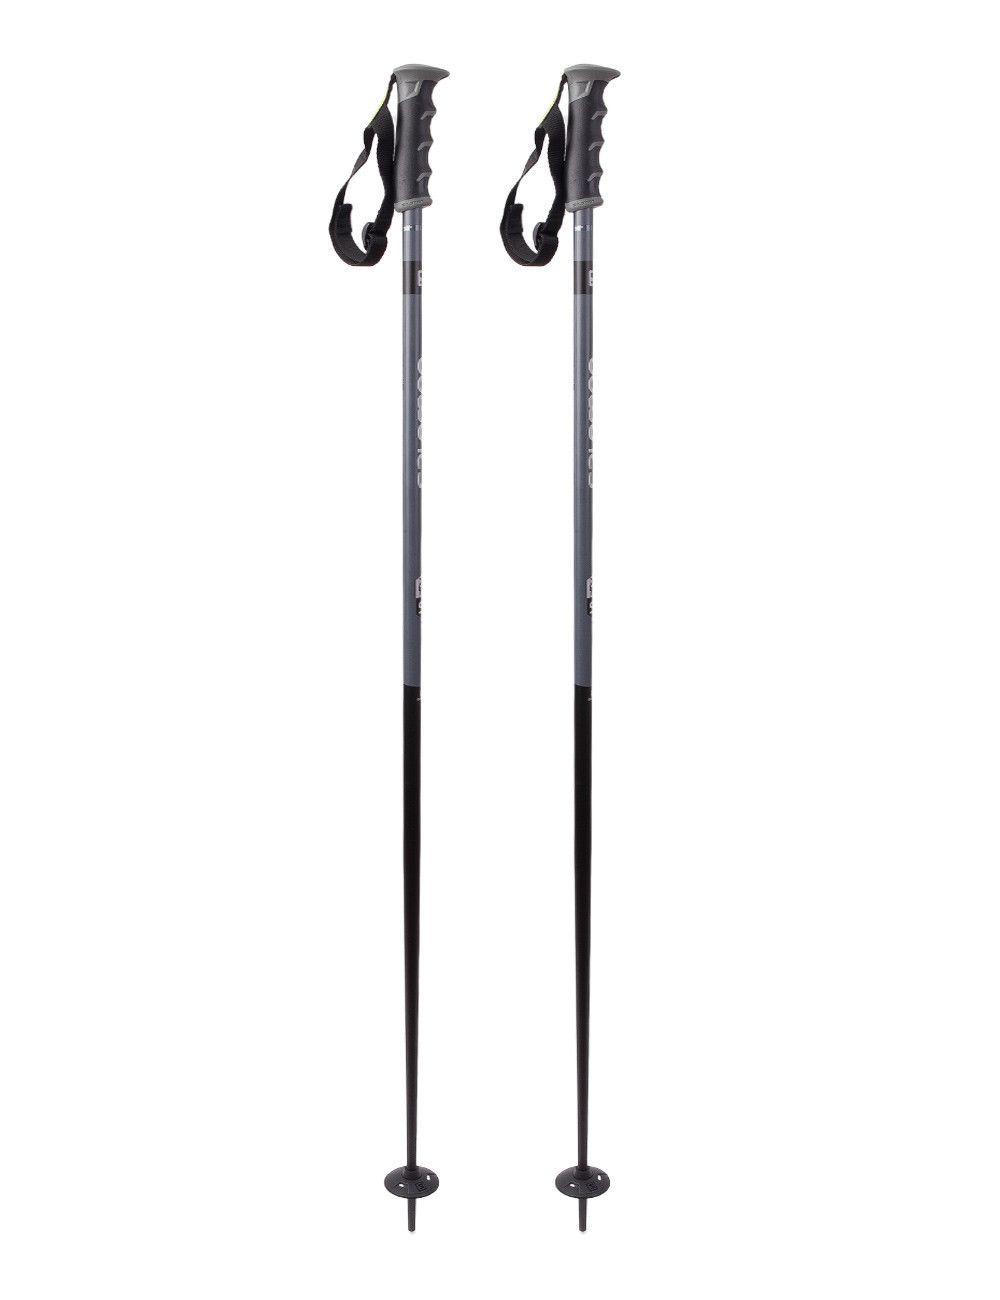 SALOMON KIJKI X NORTH S3 W BLACK 120 cm W wa